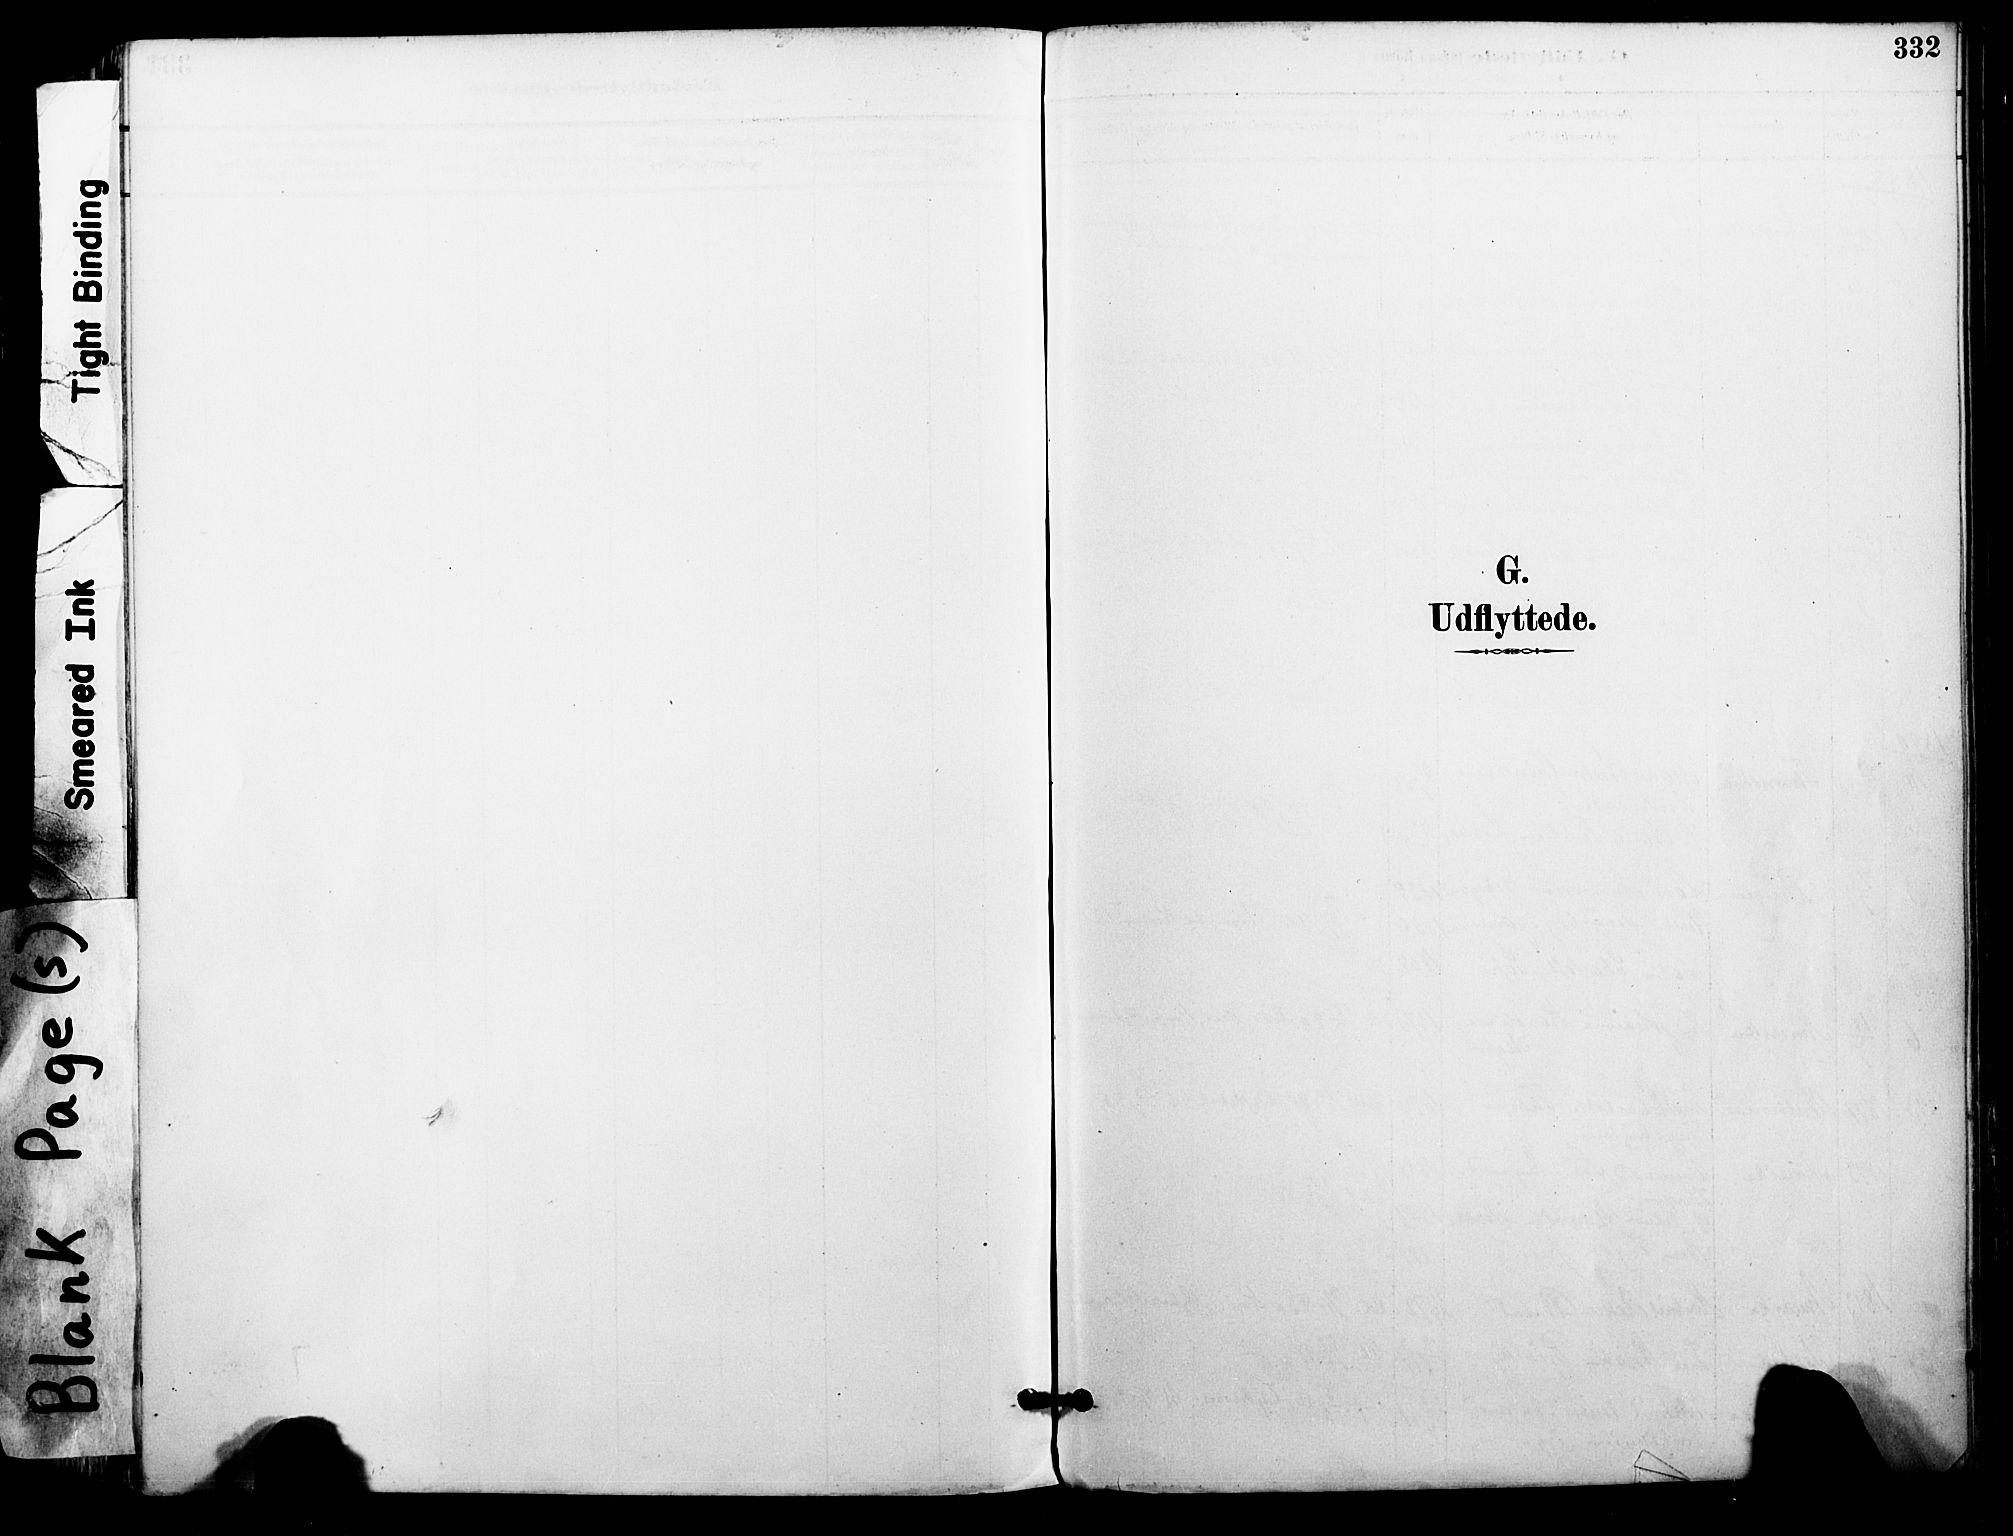 SAT, Ministerialprotokoller, klokkerbøker og fødselsregistre - Nordland, 801/L0010: Ministerialbok nr. 801A10, 1888-1899, s. 332